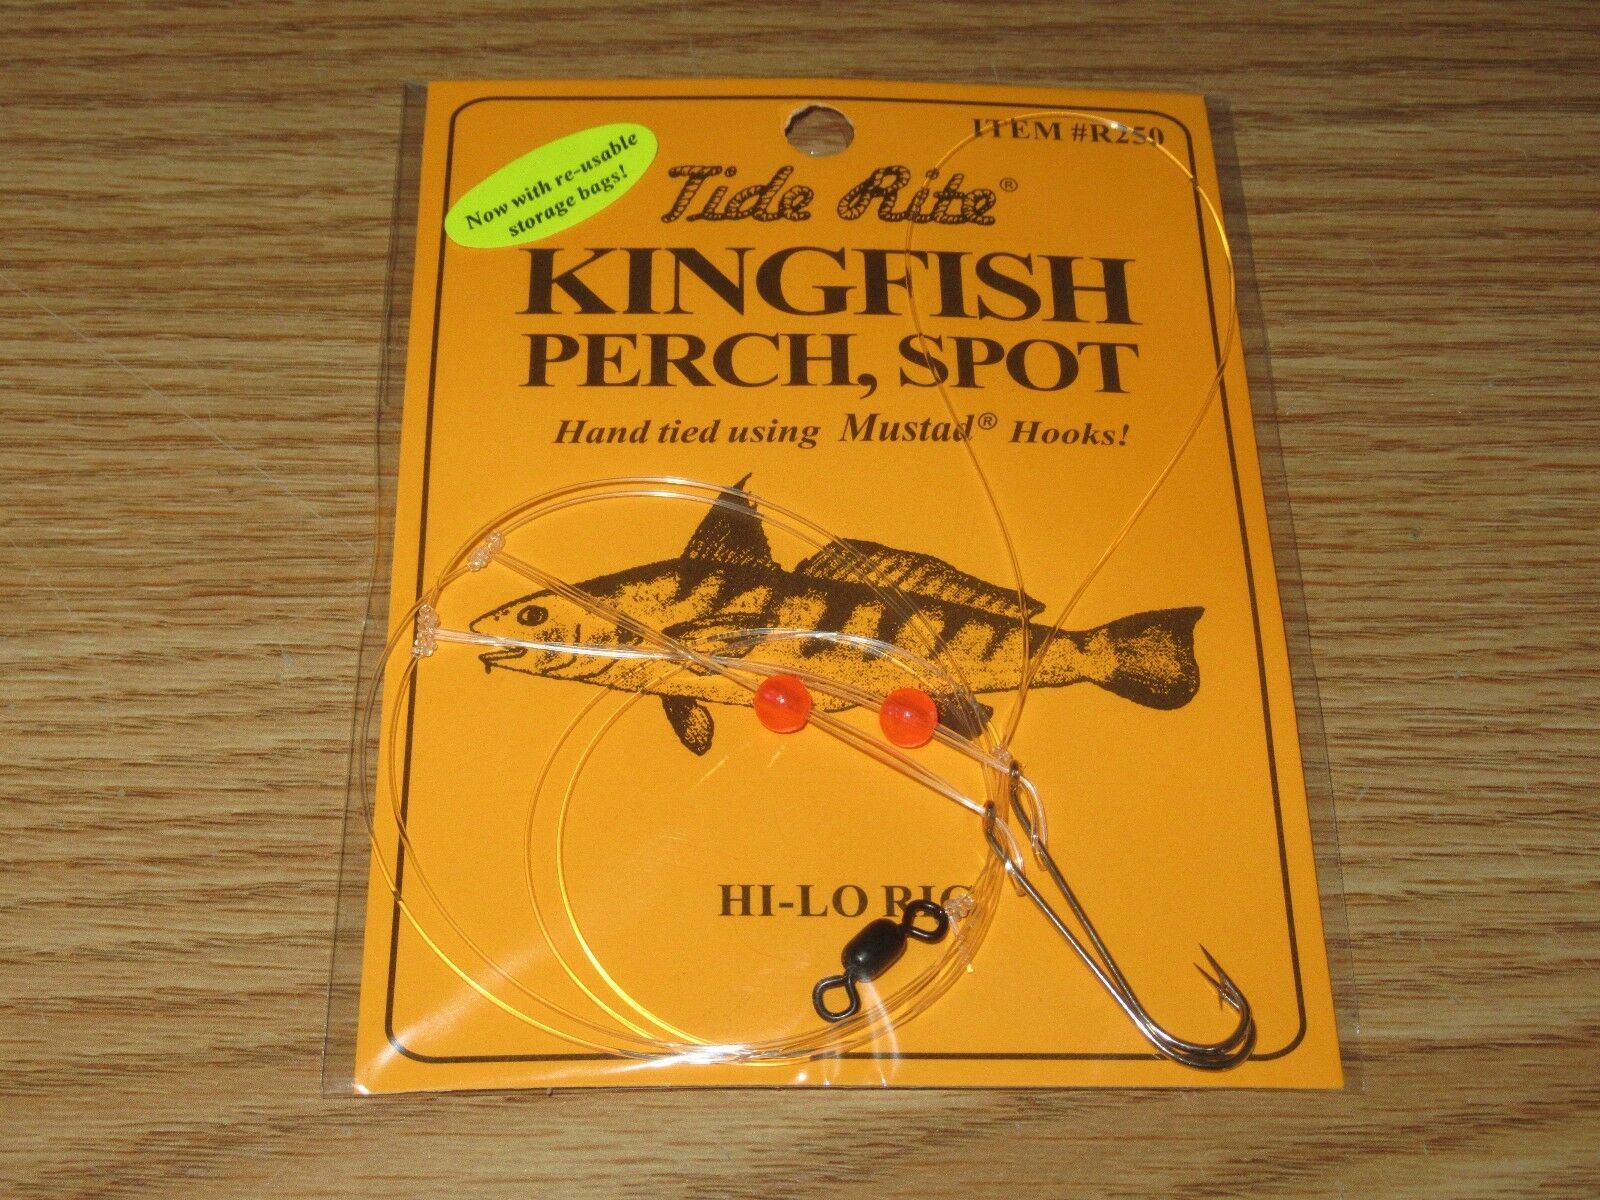 24 KINGFISH PERCH SPOT RIGS TIDE RITE R250 HILO SALTWATER RIG FISHING MUSTAD